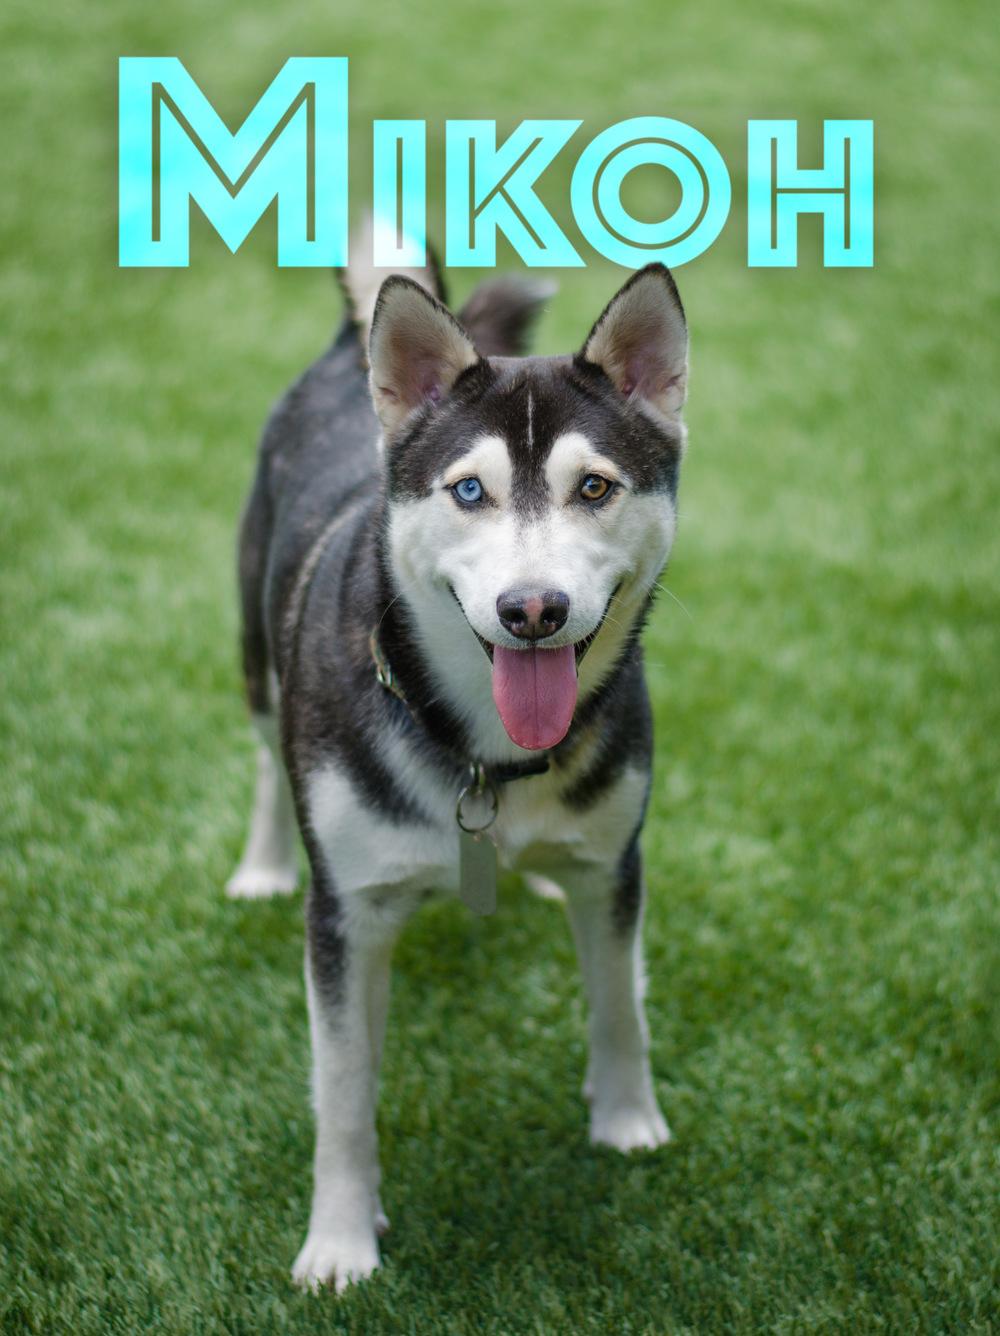 Mikoh-Name-Web-DSC_1527.jpg